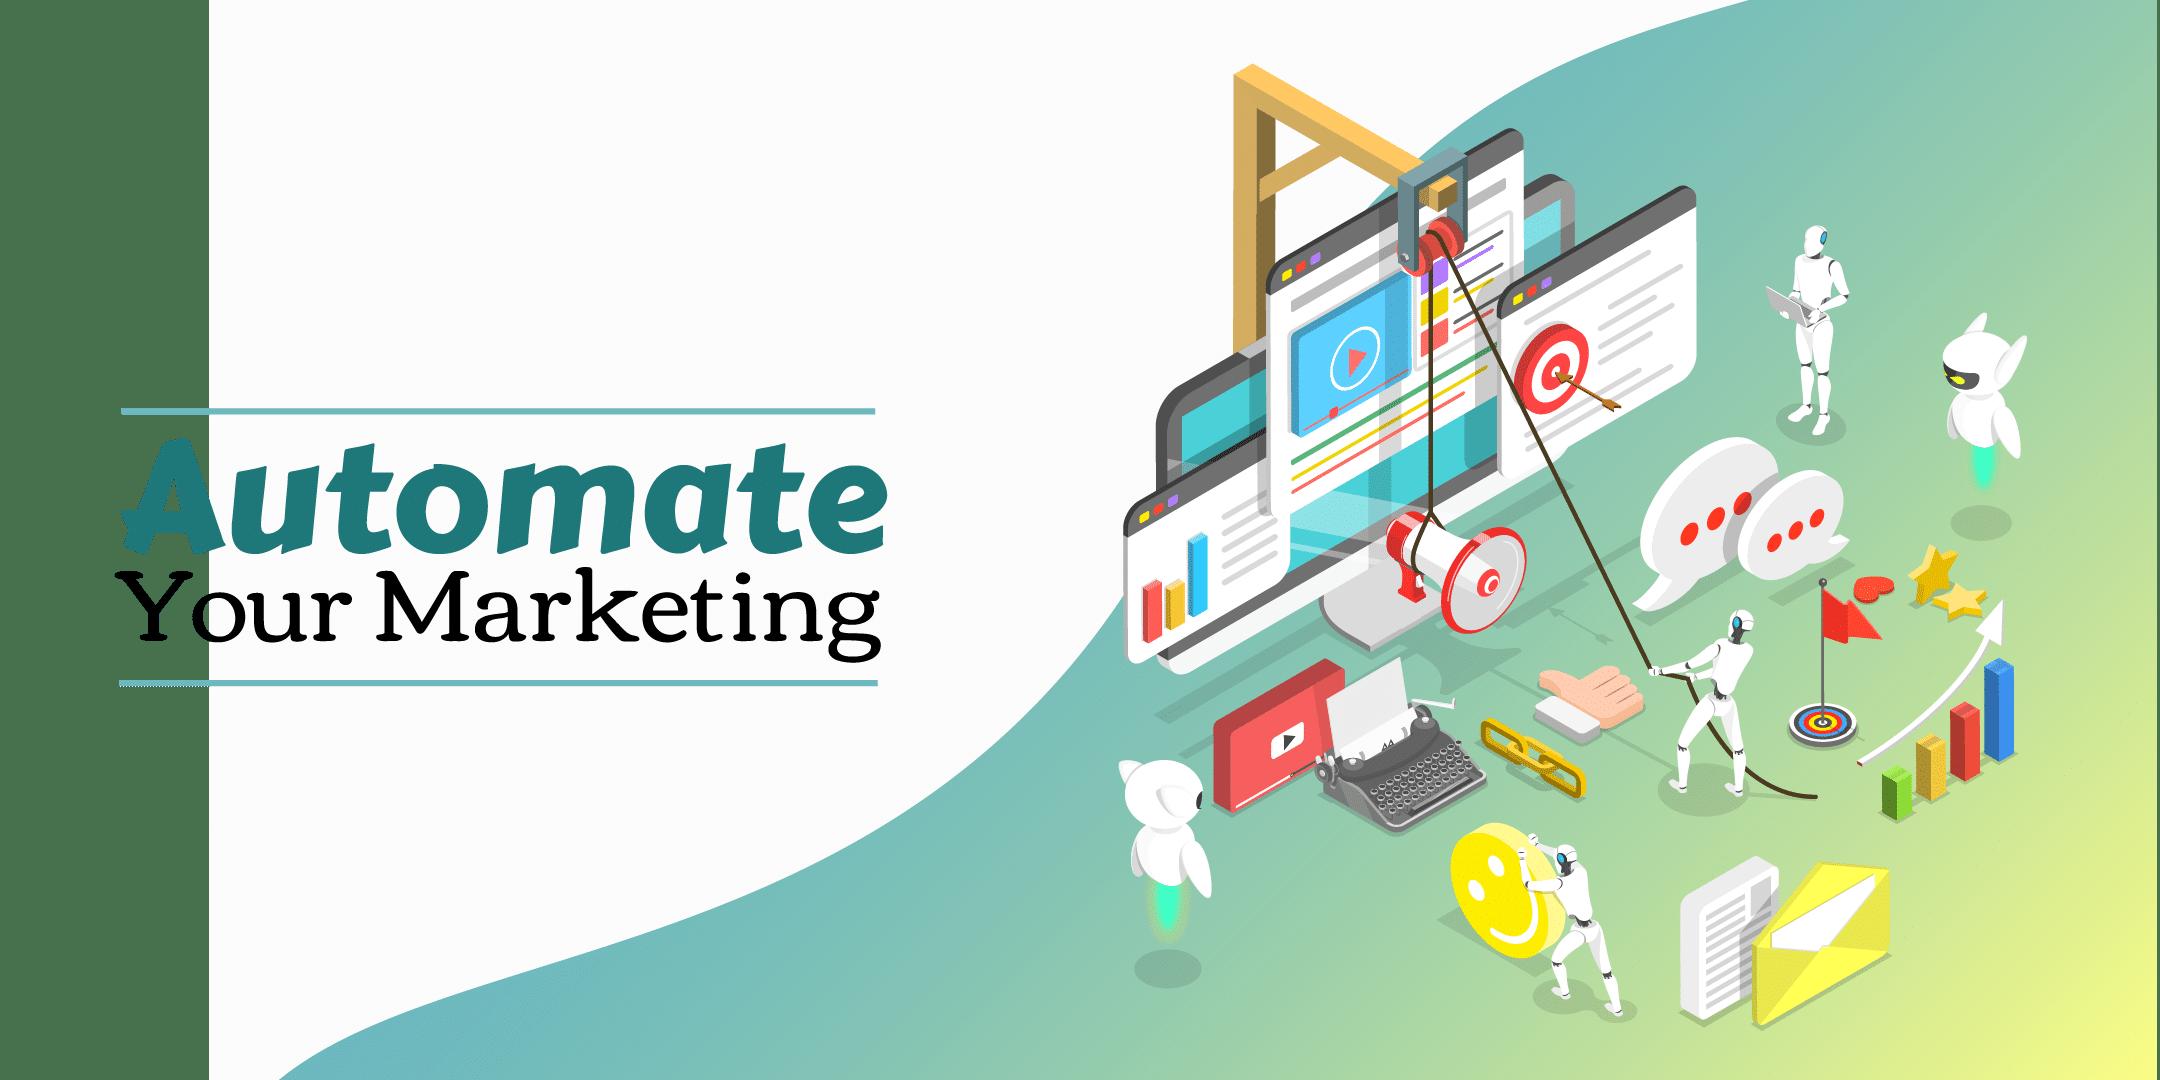 Automate your marketing image